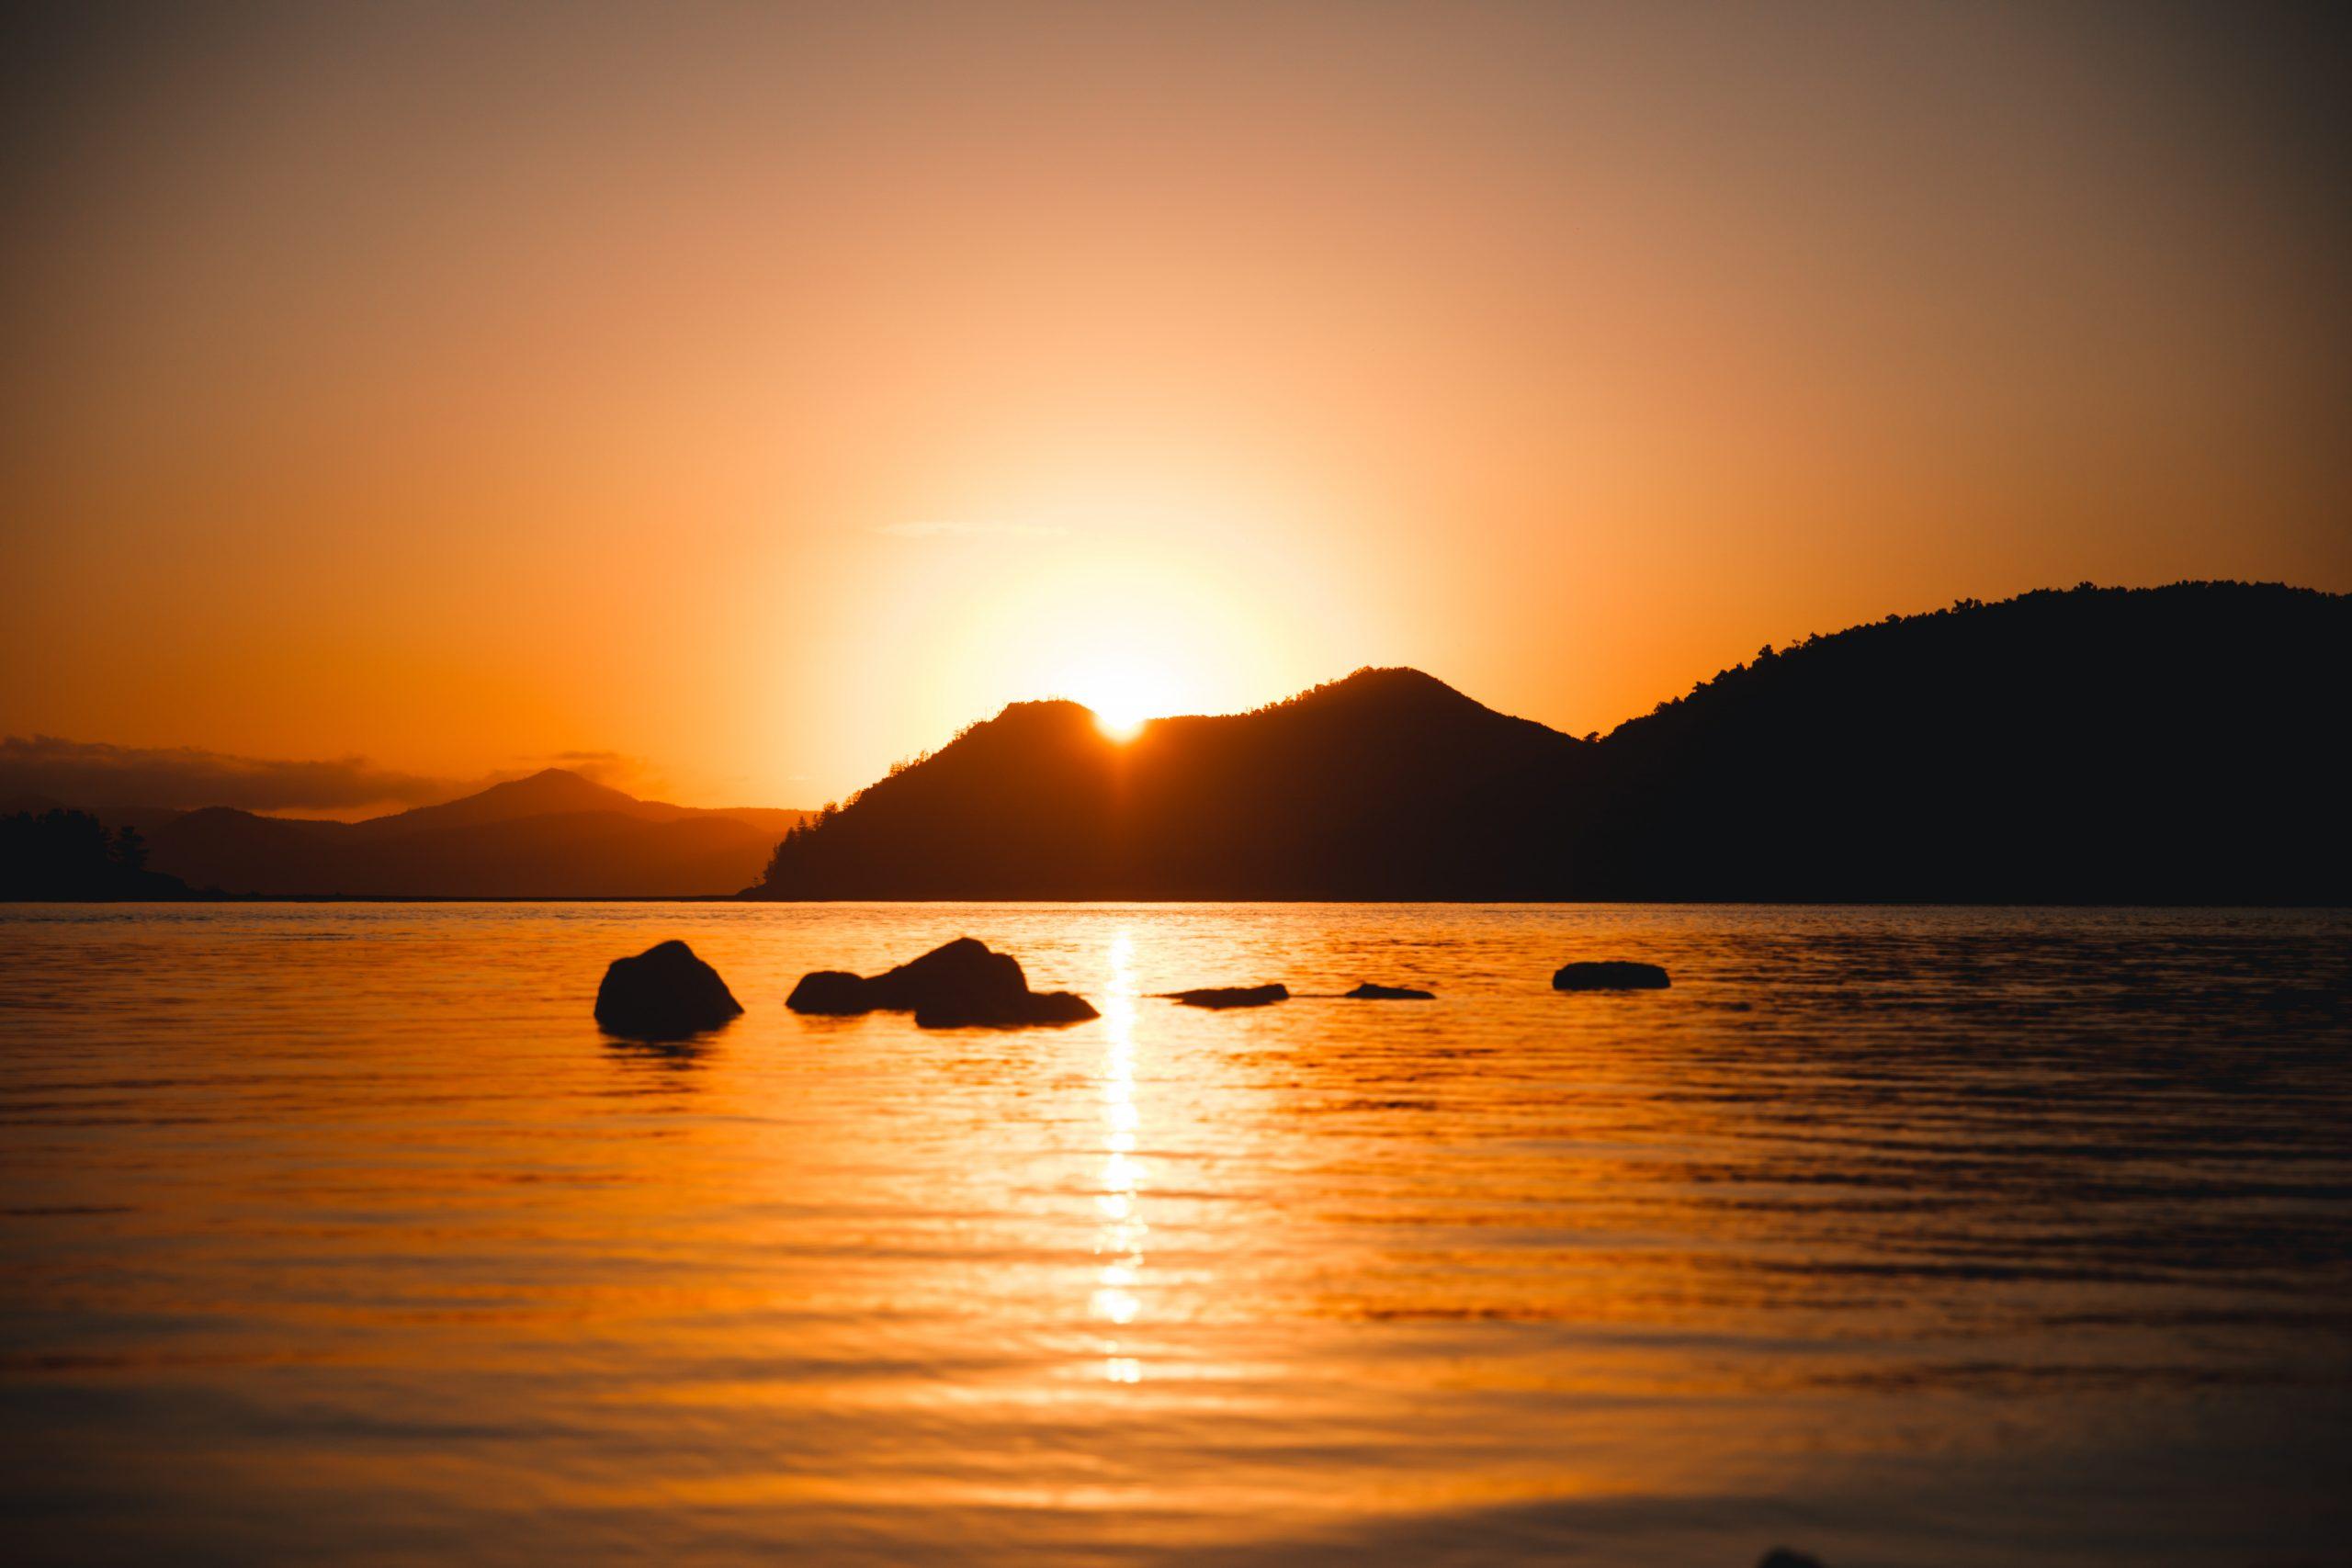 sun peaking through island mountain in the whitsunday islands during incredible sunrise